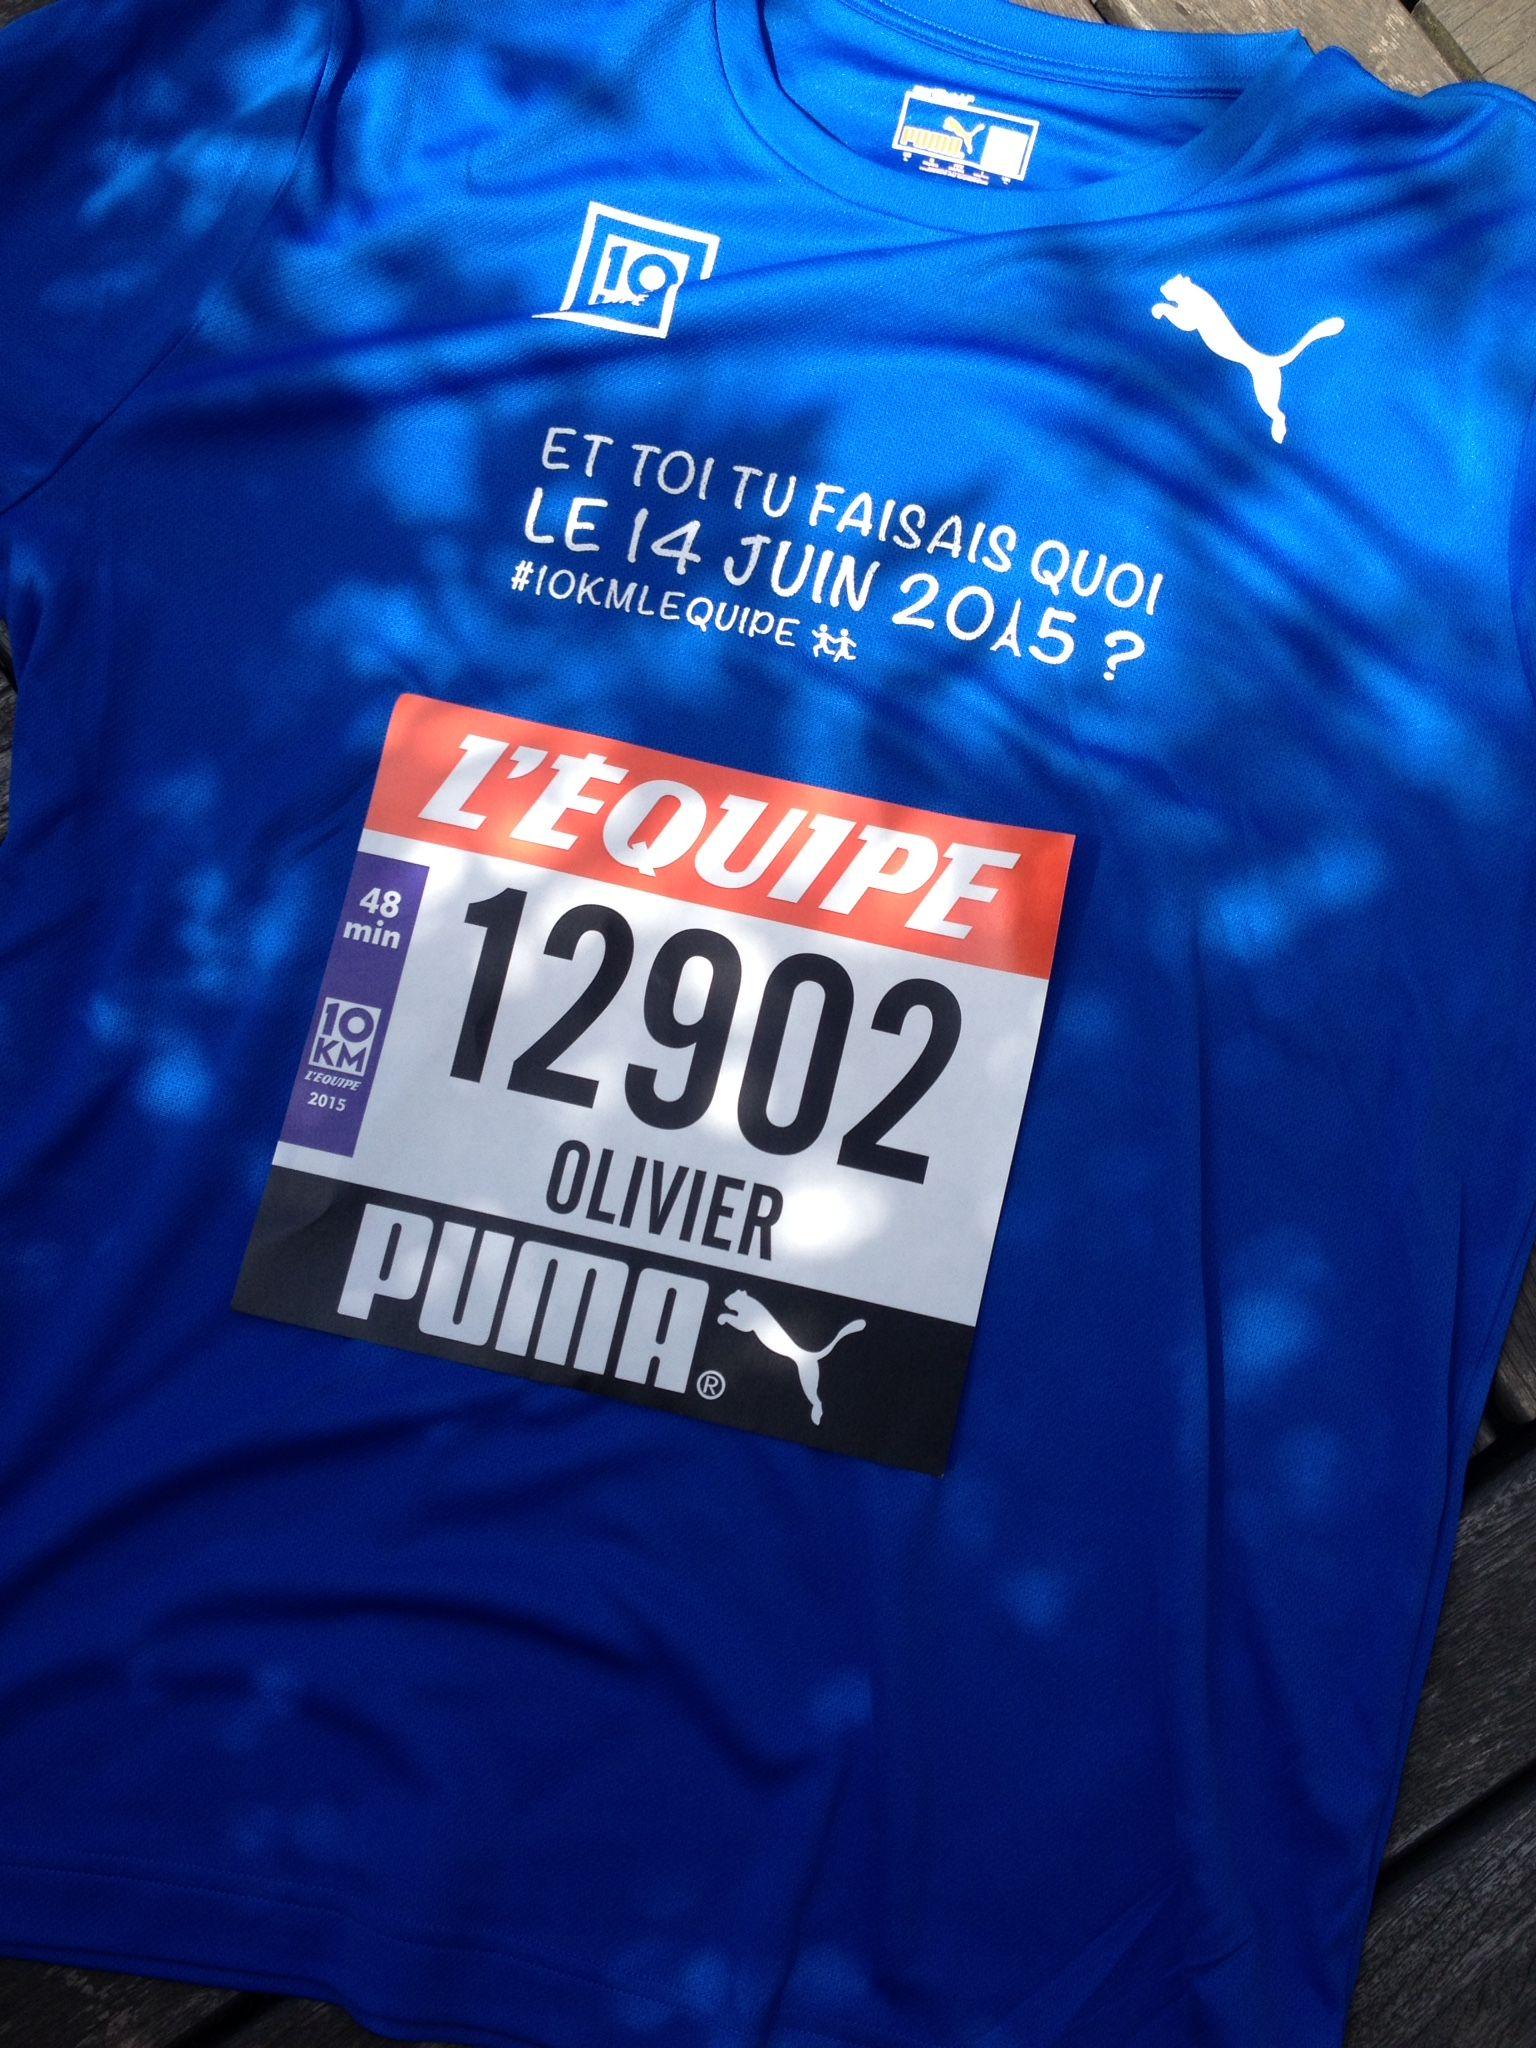 10 kms L'EQUIPE - Paris